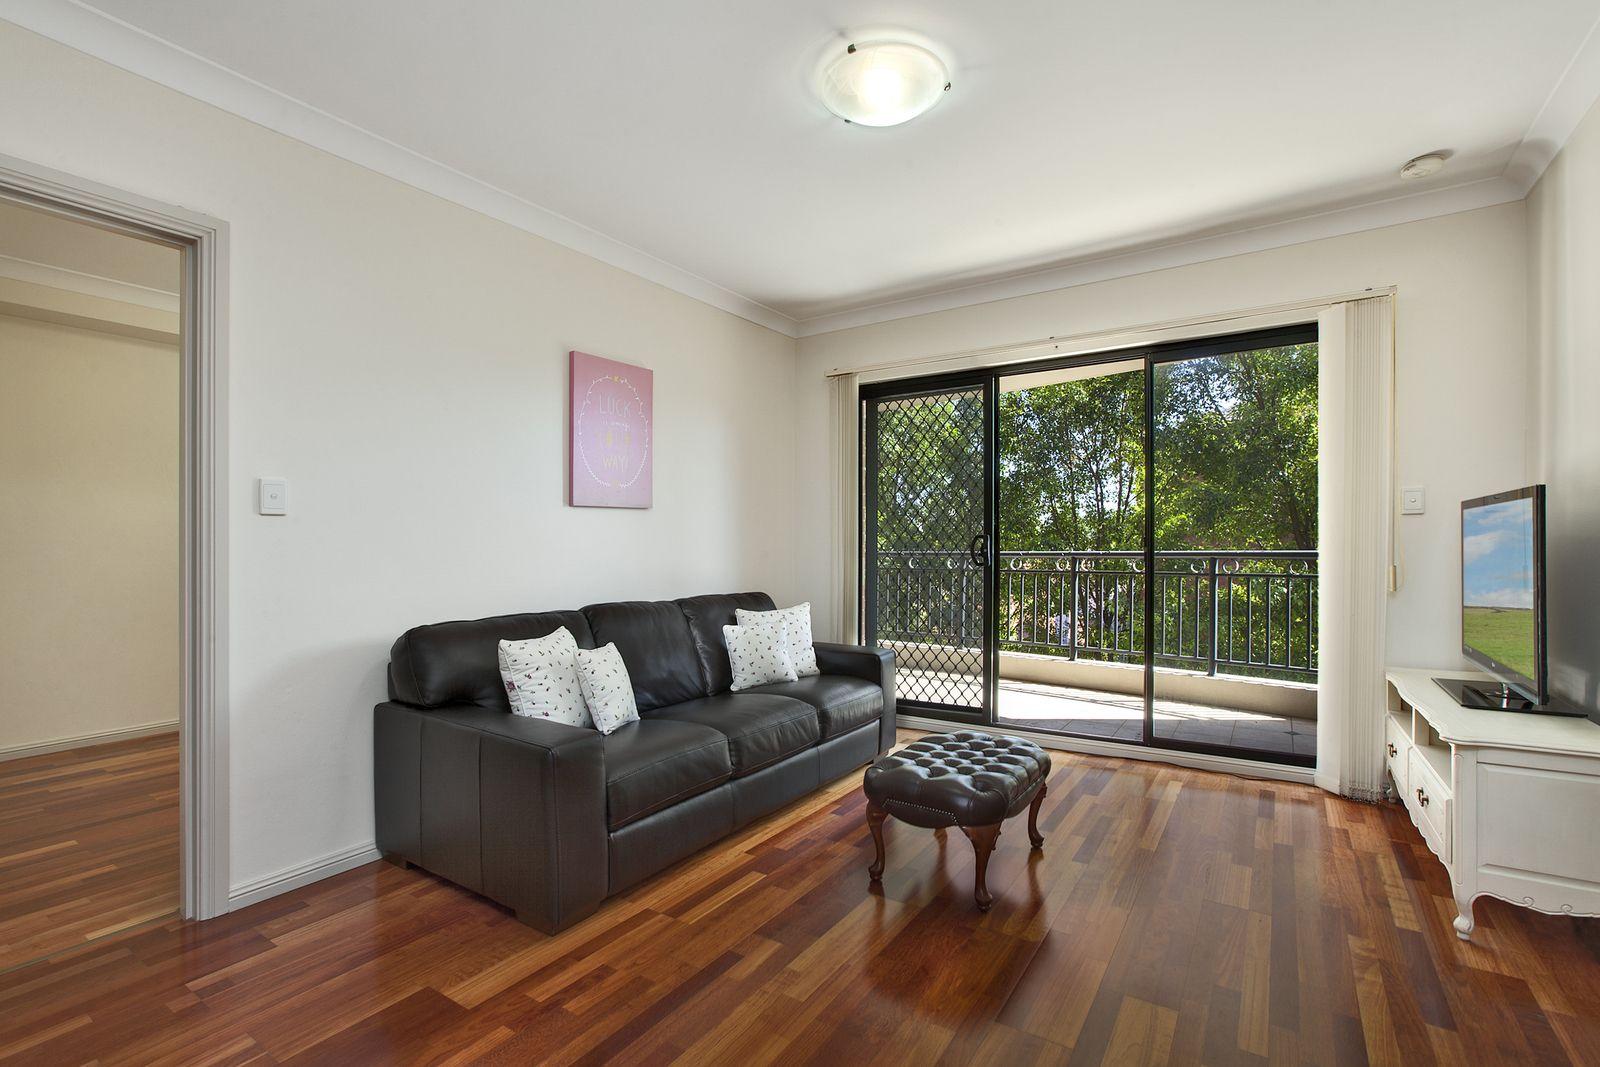 14/253 Carrington Road, Coogee NSW 2034, Image 0